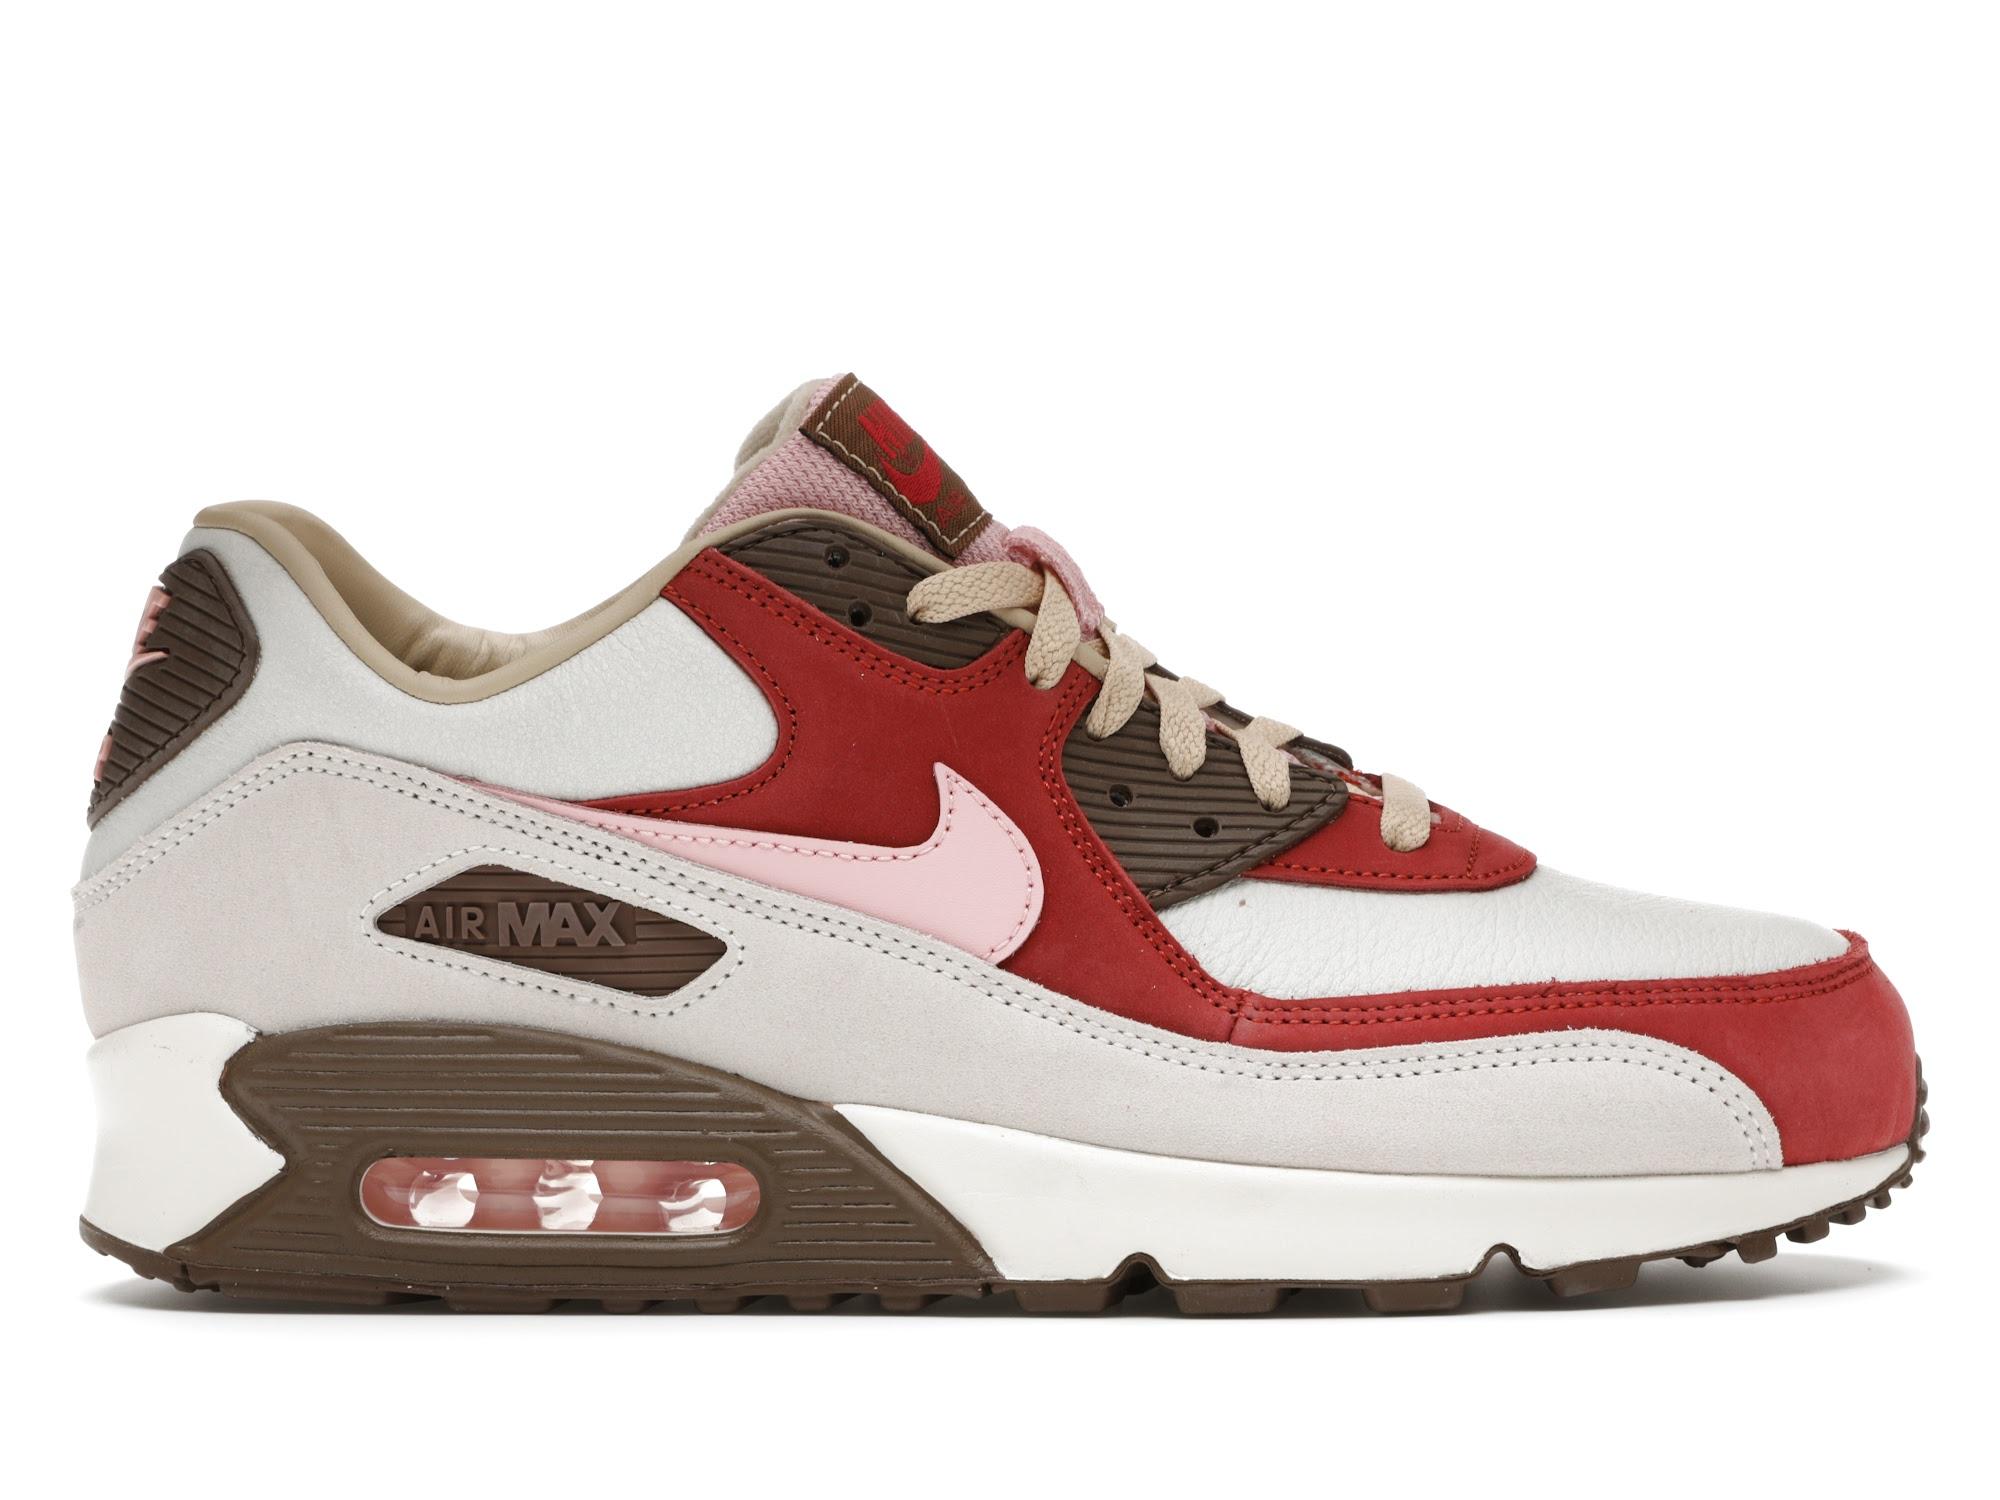 Nike Air Max 90 NRG Bacon (2021)